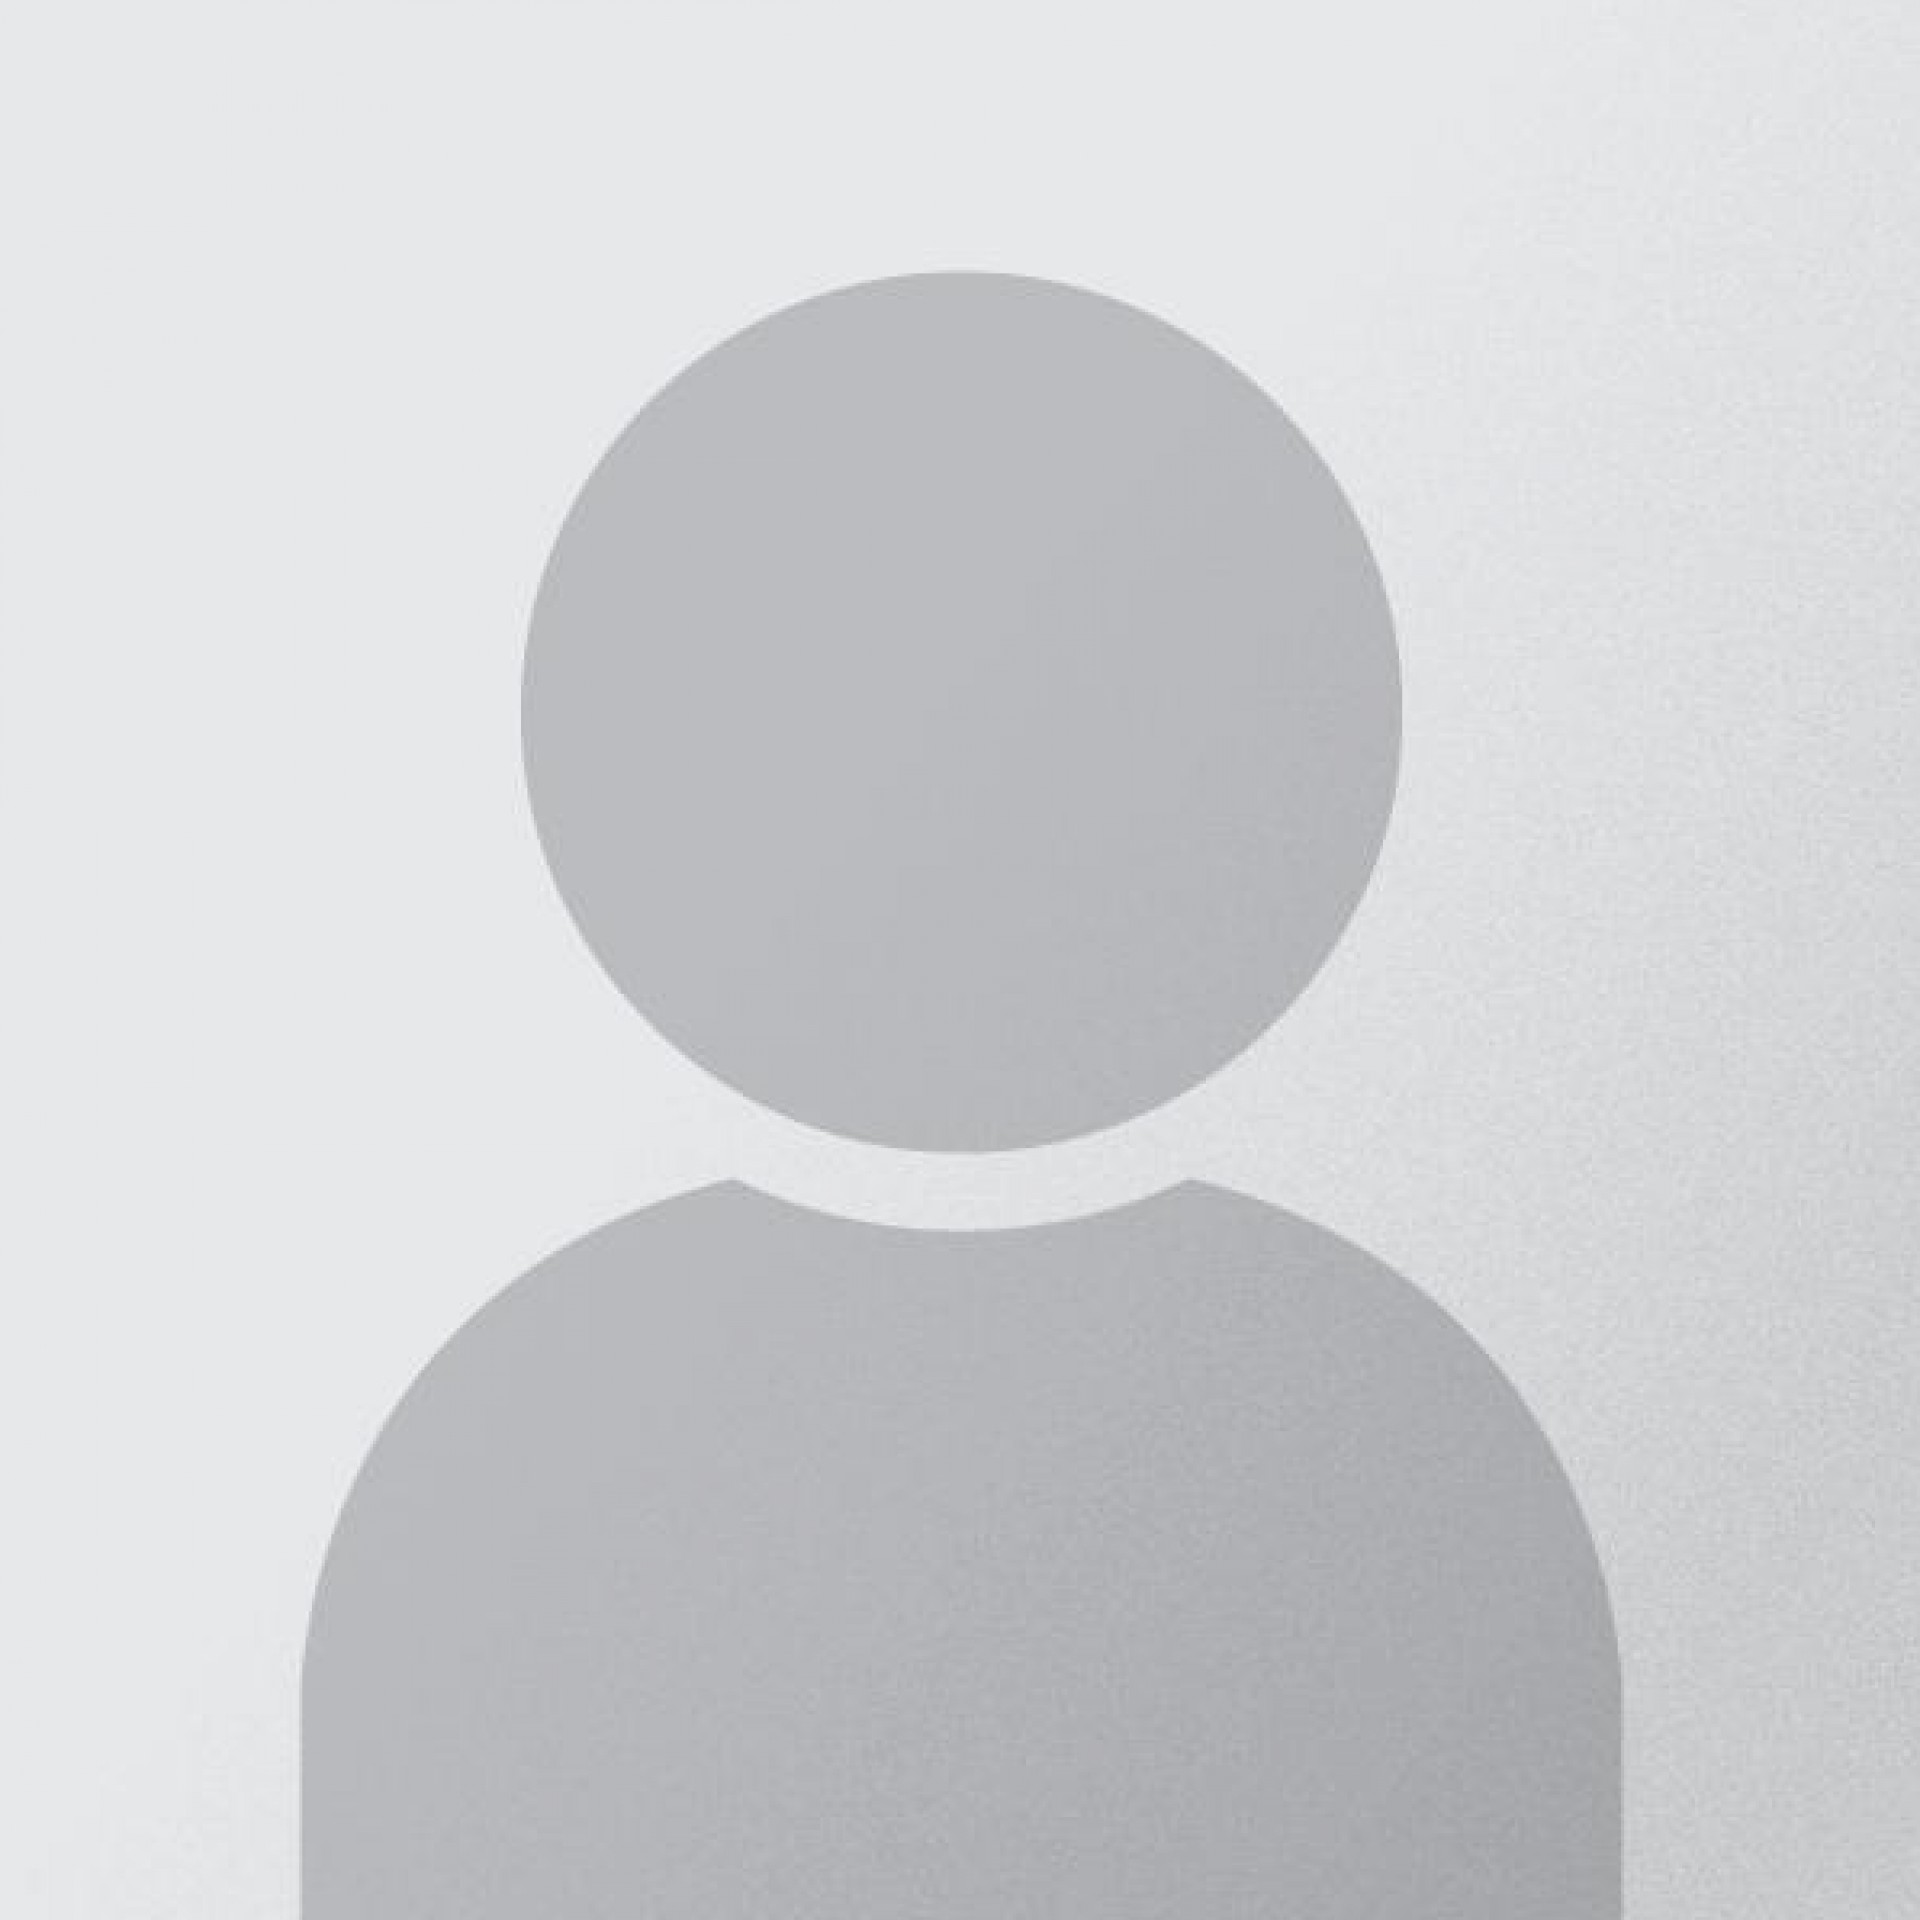 fotografia p021 profilu 0102HNXLQV